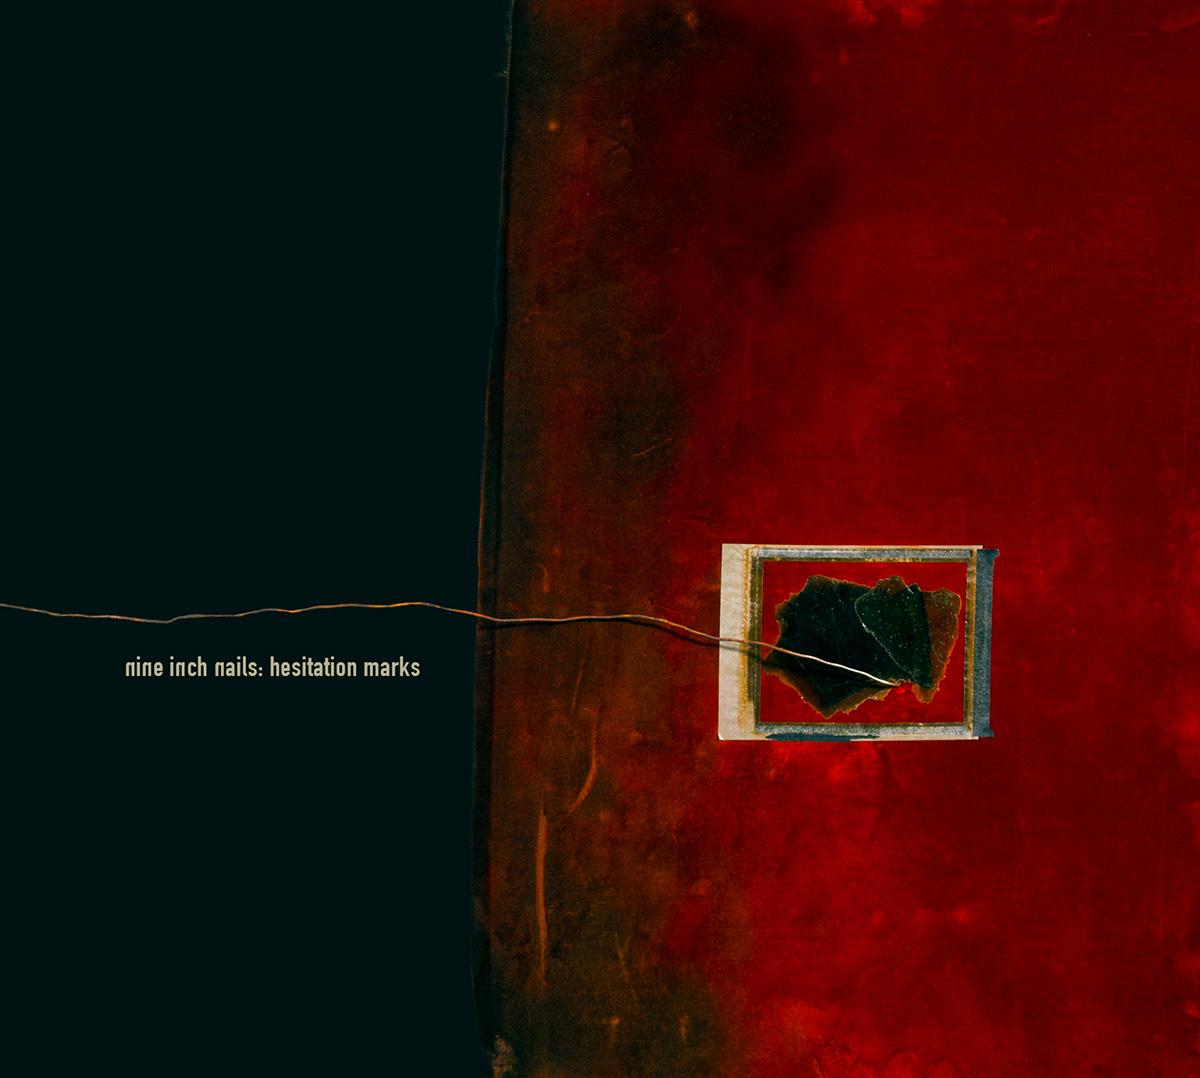 Hesitation Marks Wallpaper Hesitation Marks | Des...